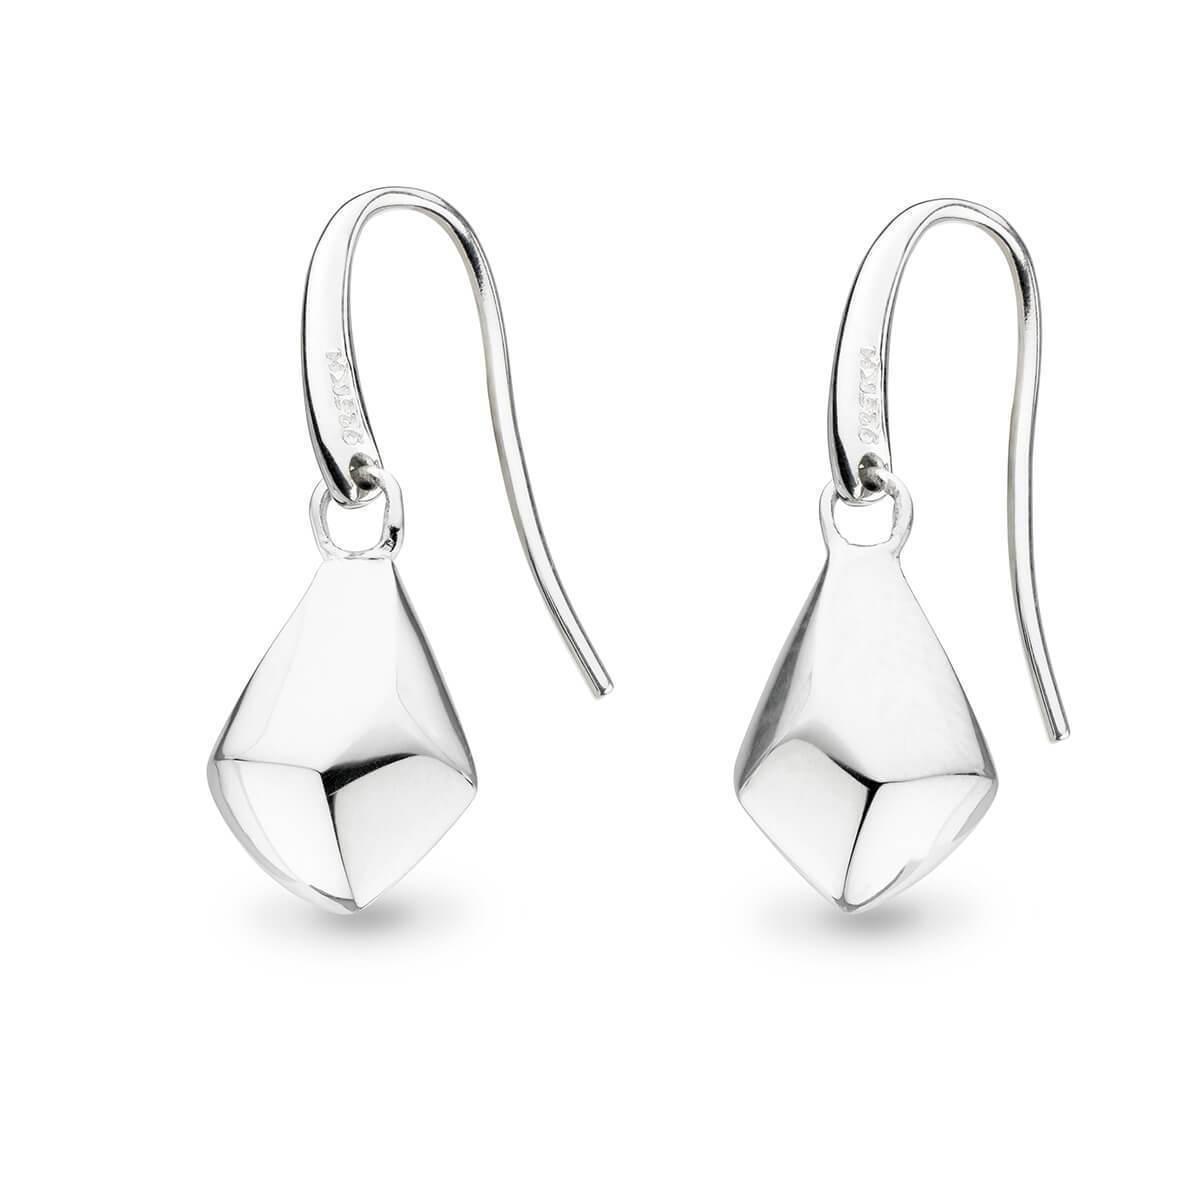 Kit Heath Coast Rock Angled Drop Earrings NXR7QVHUu